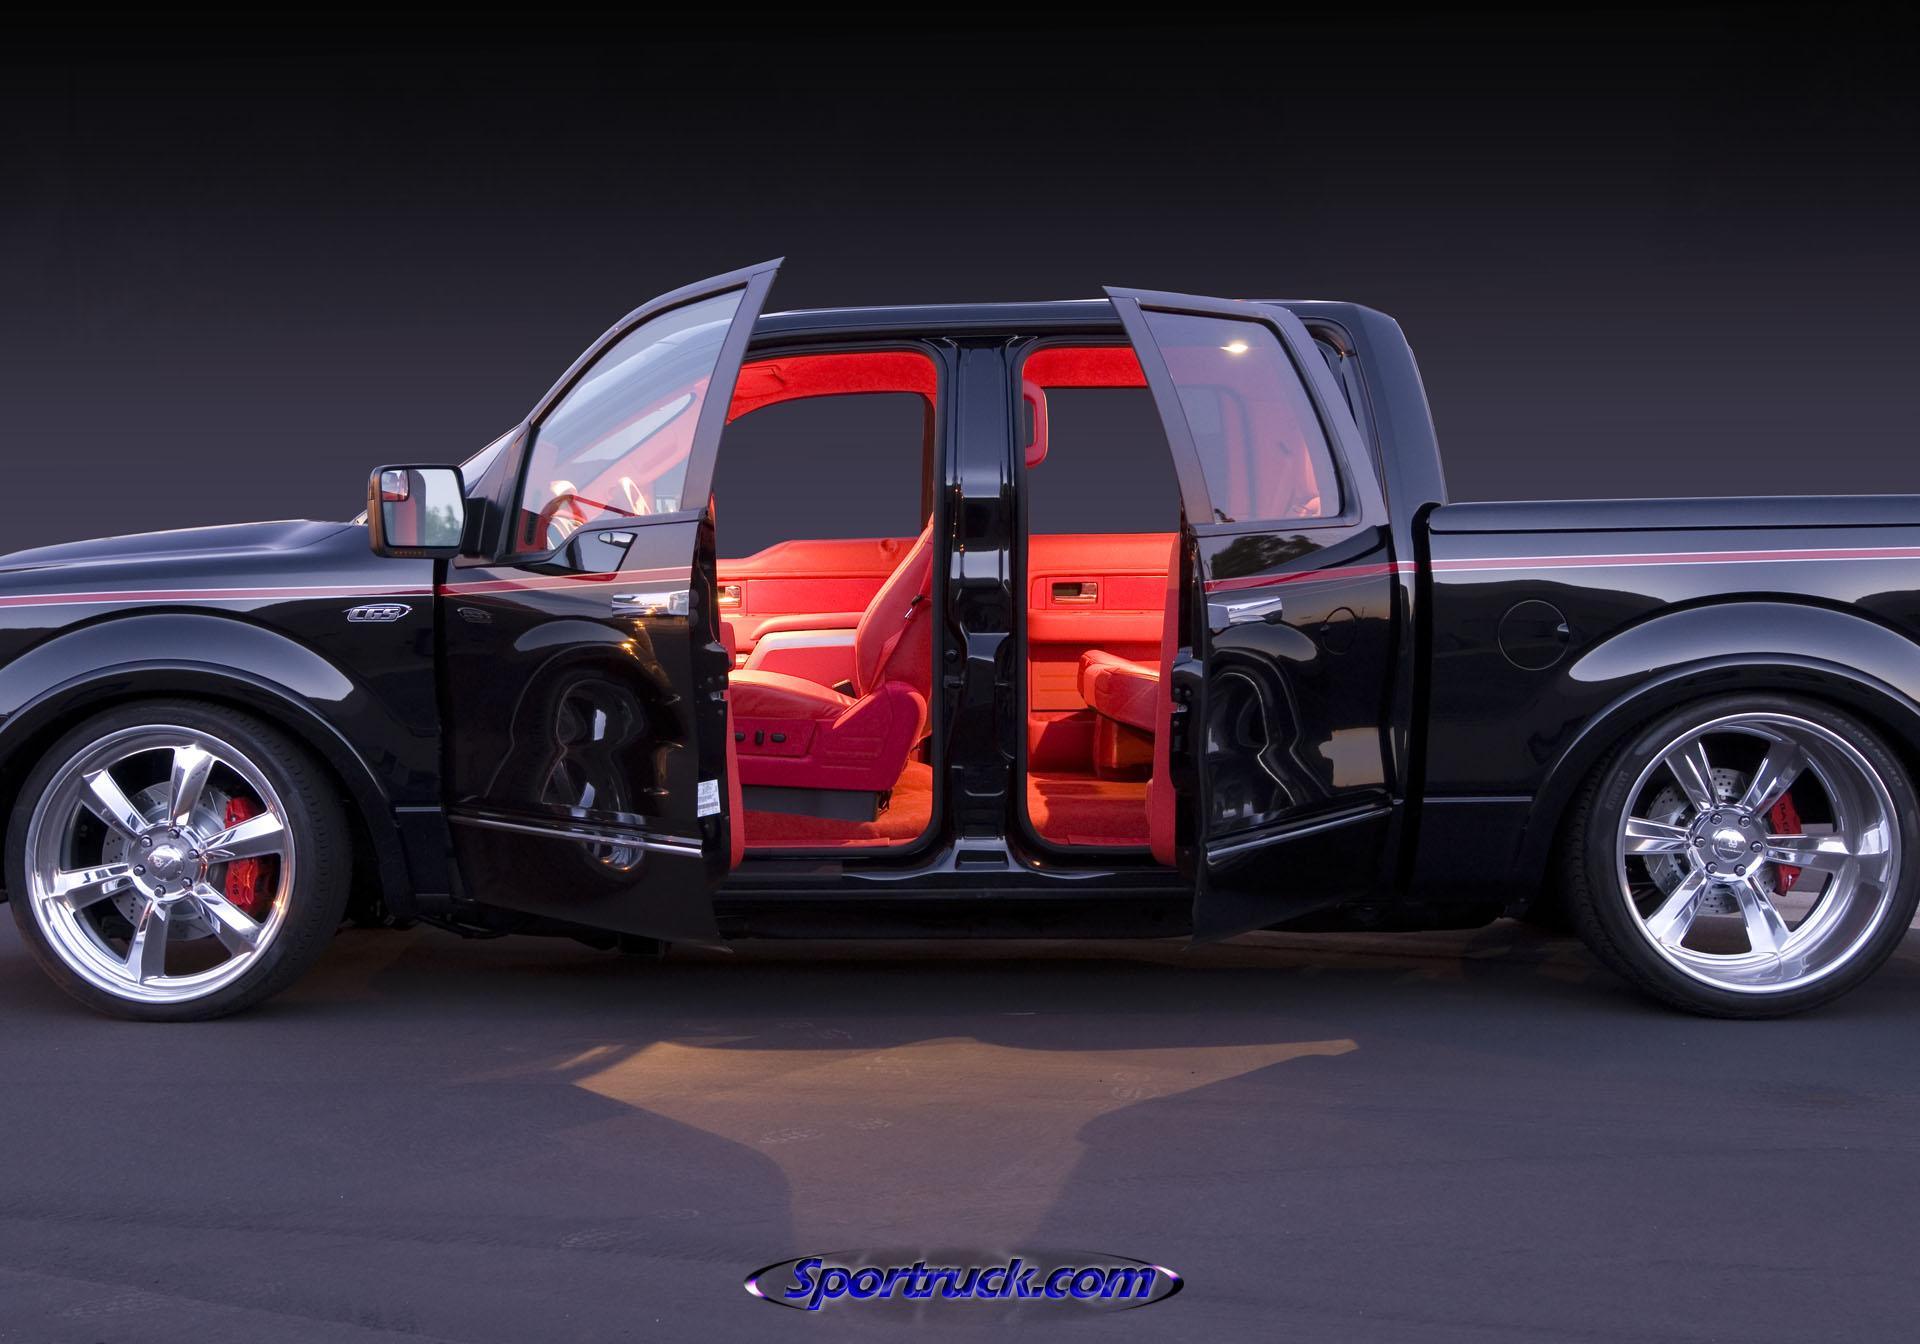 Tarmac Ford F-150 - Casey Scranton - CGS Performance Products - Feature Truck - Sportruck.com